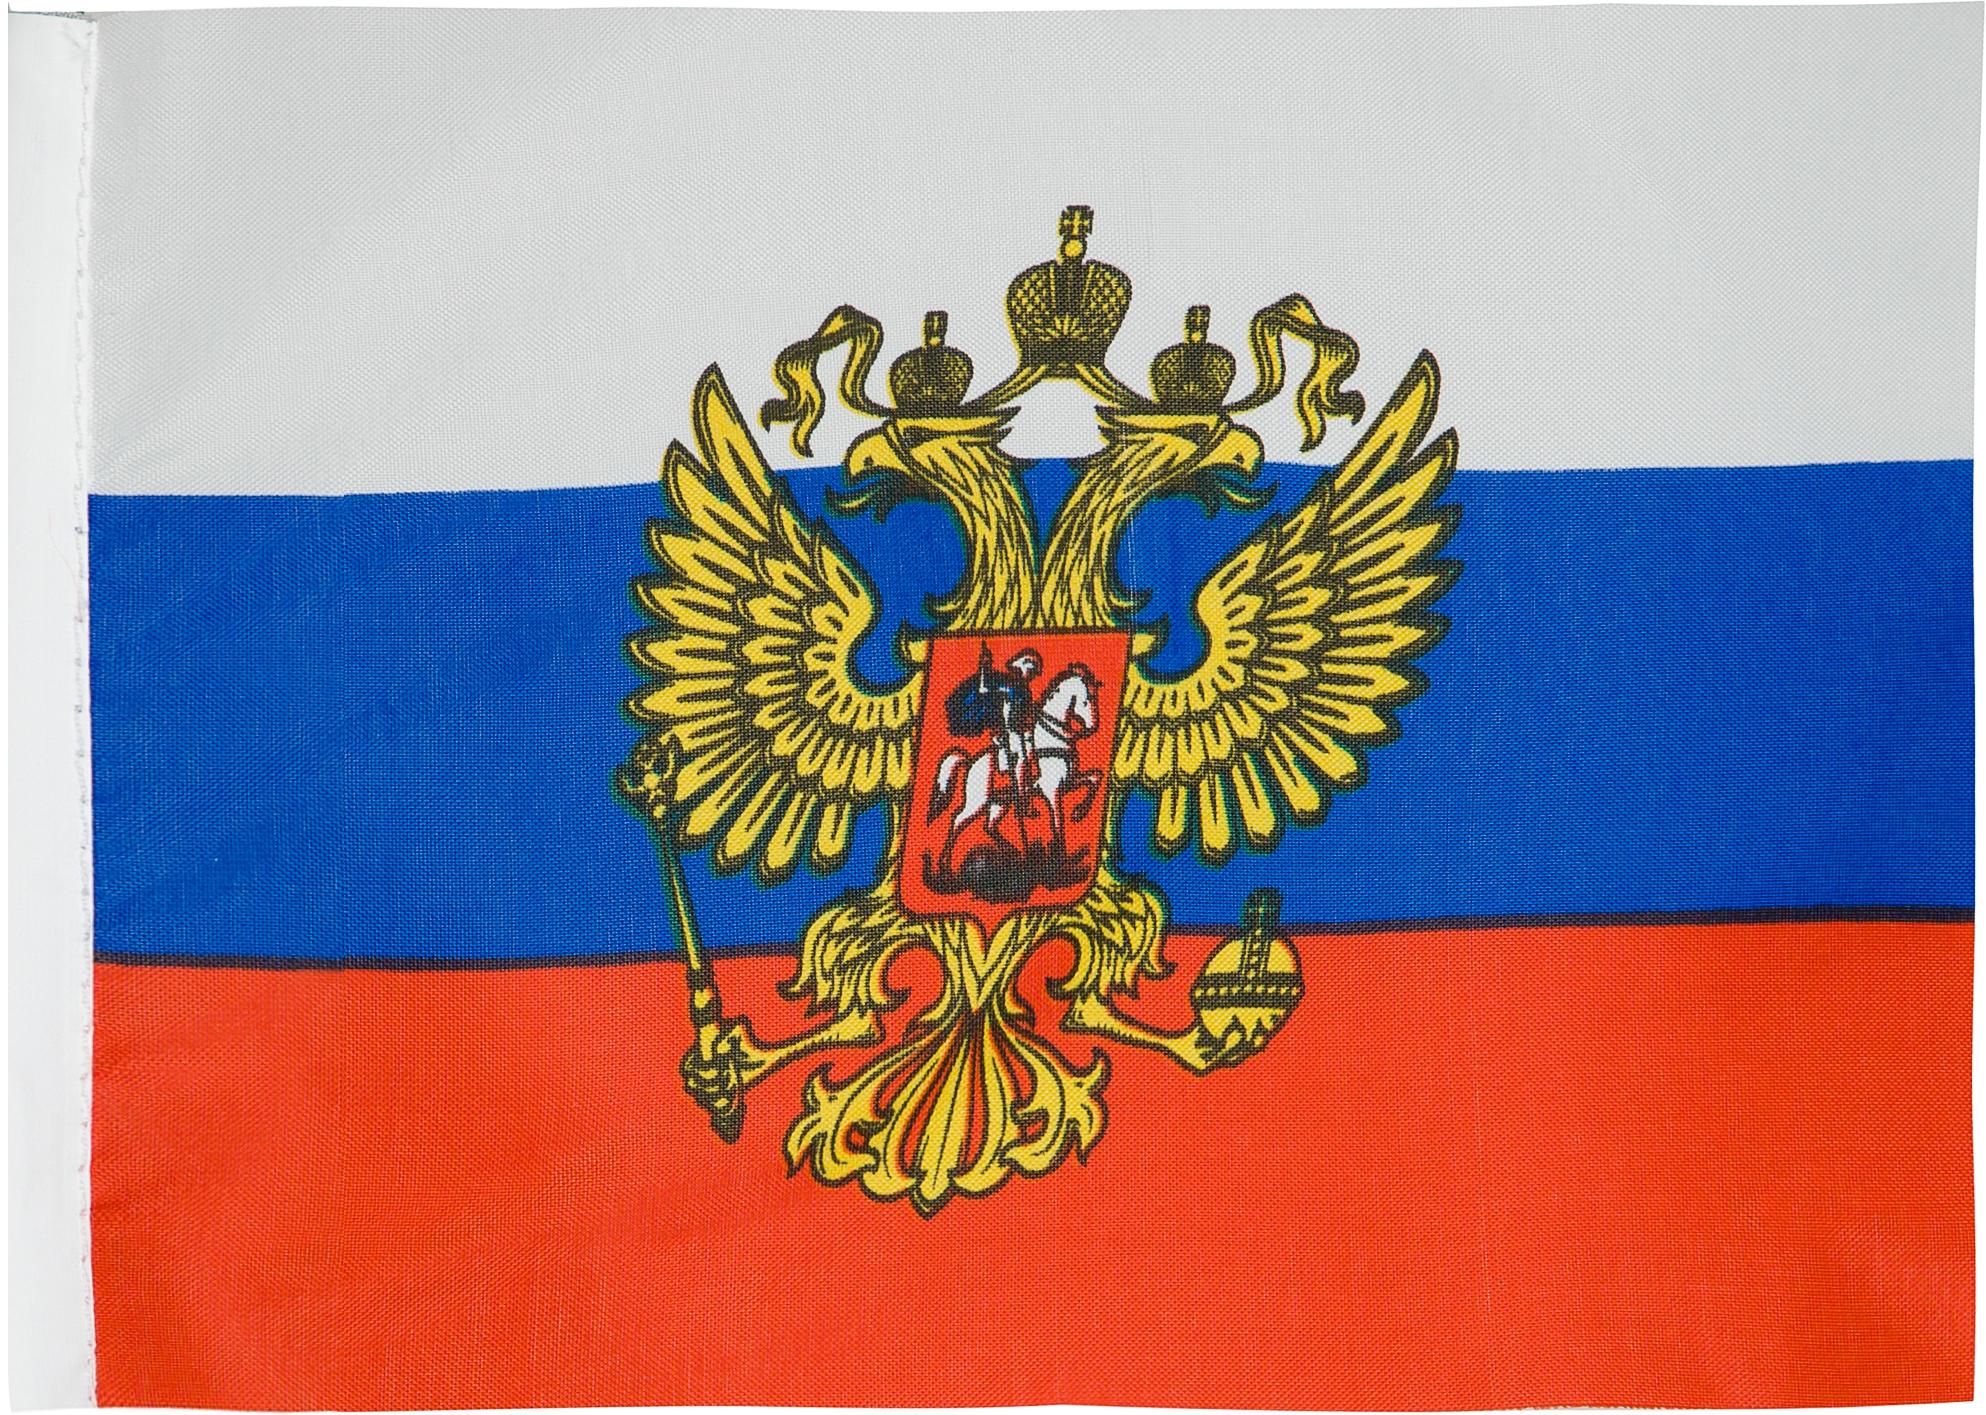 купить BRO RUSSIAN Флаг малый на держателе BRO RUSSIAN 10 х 15 см по цене 149 рублей